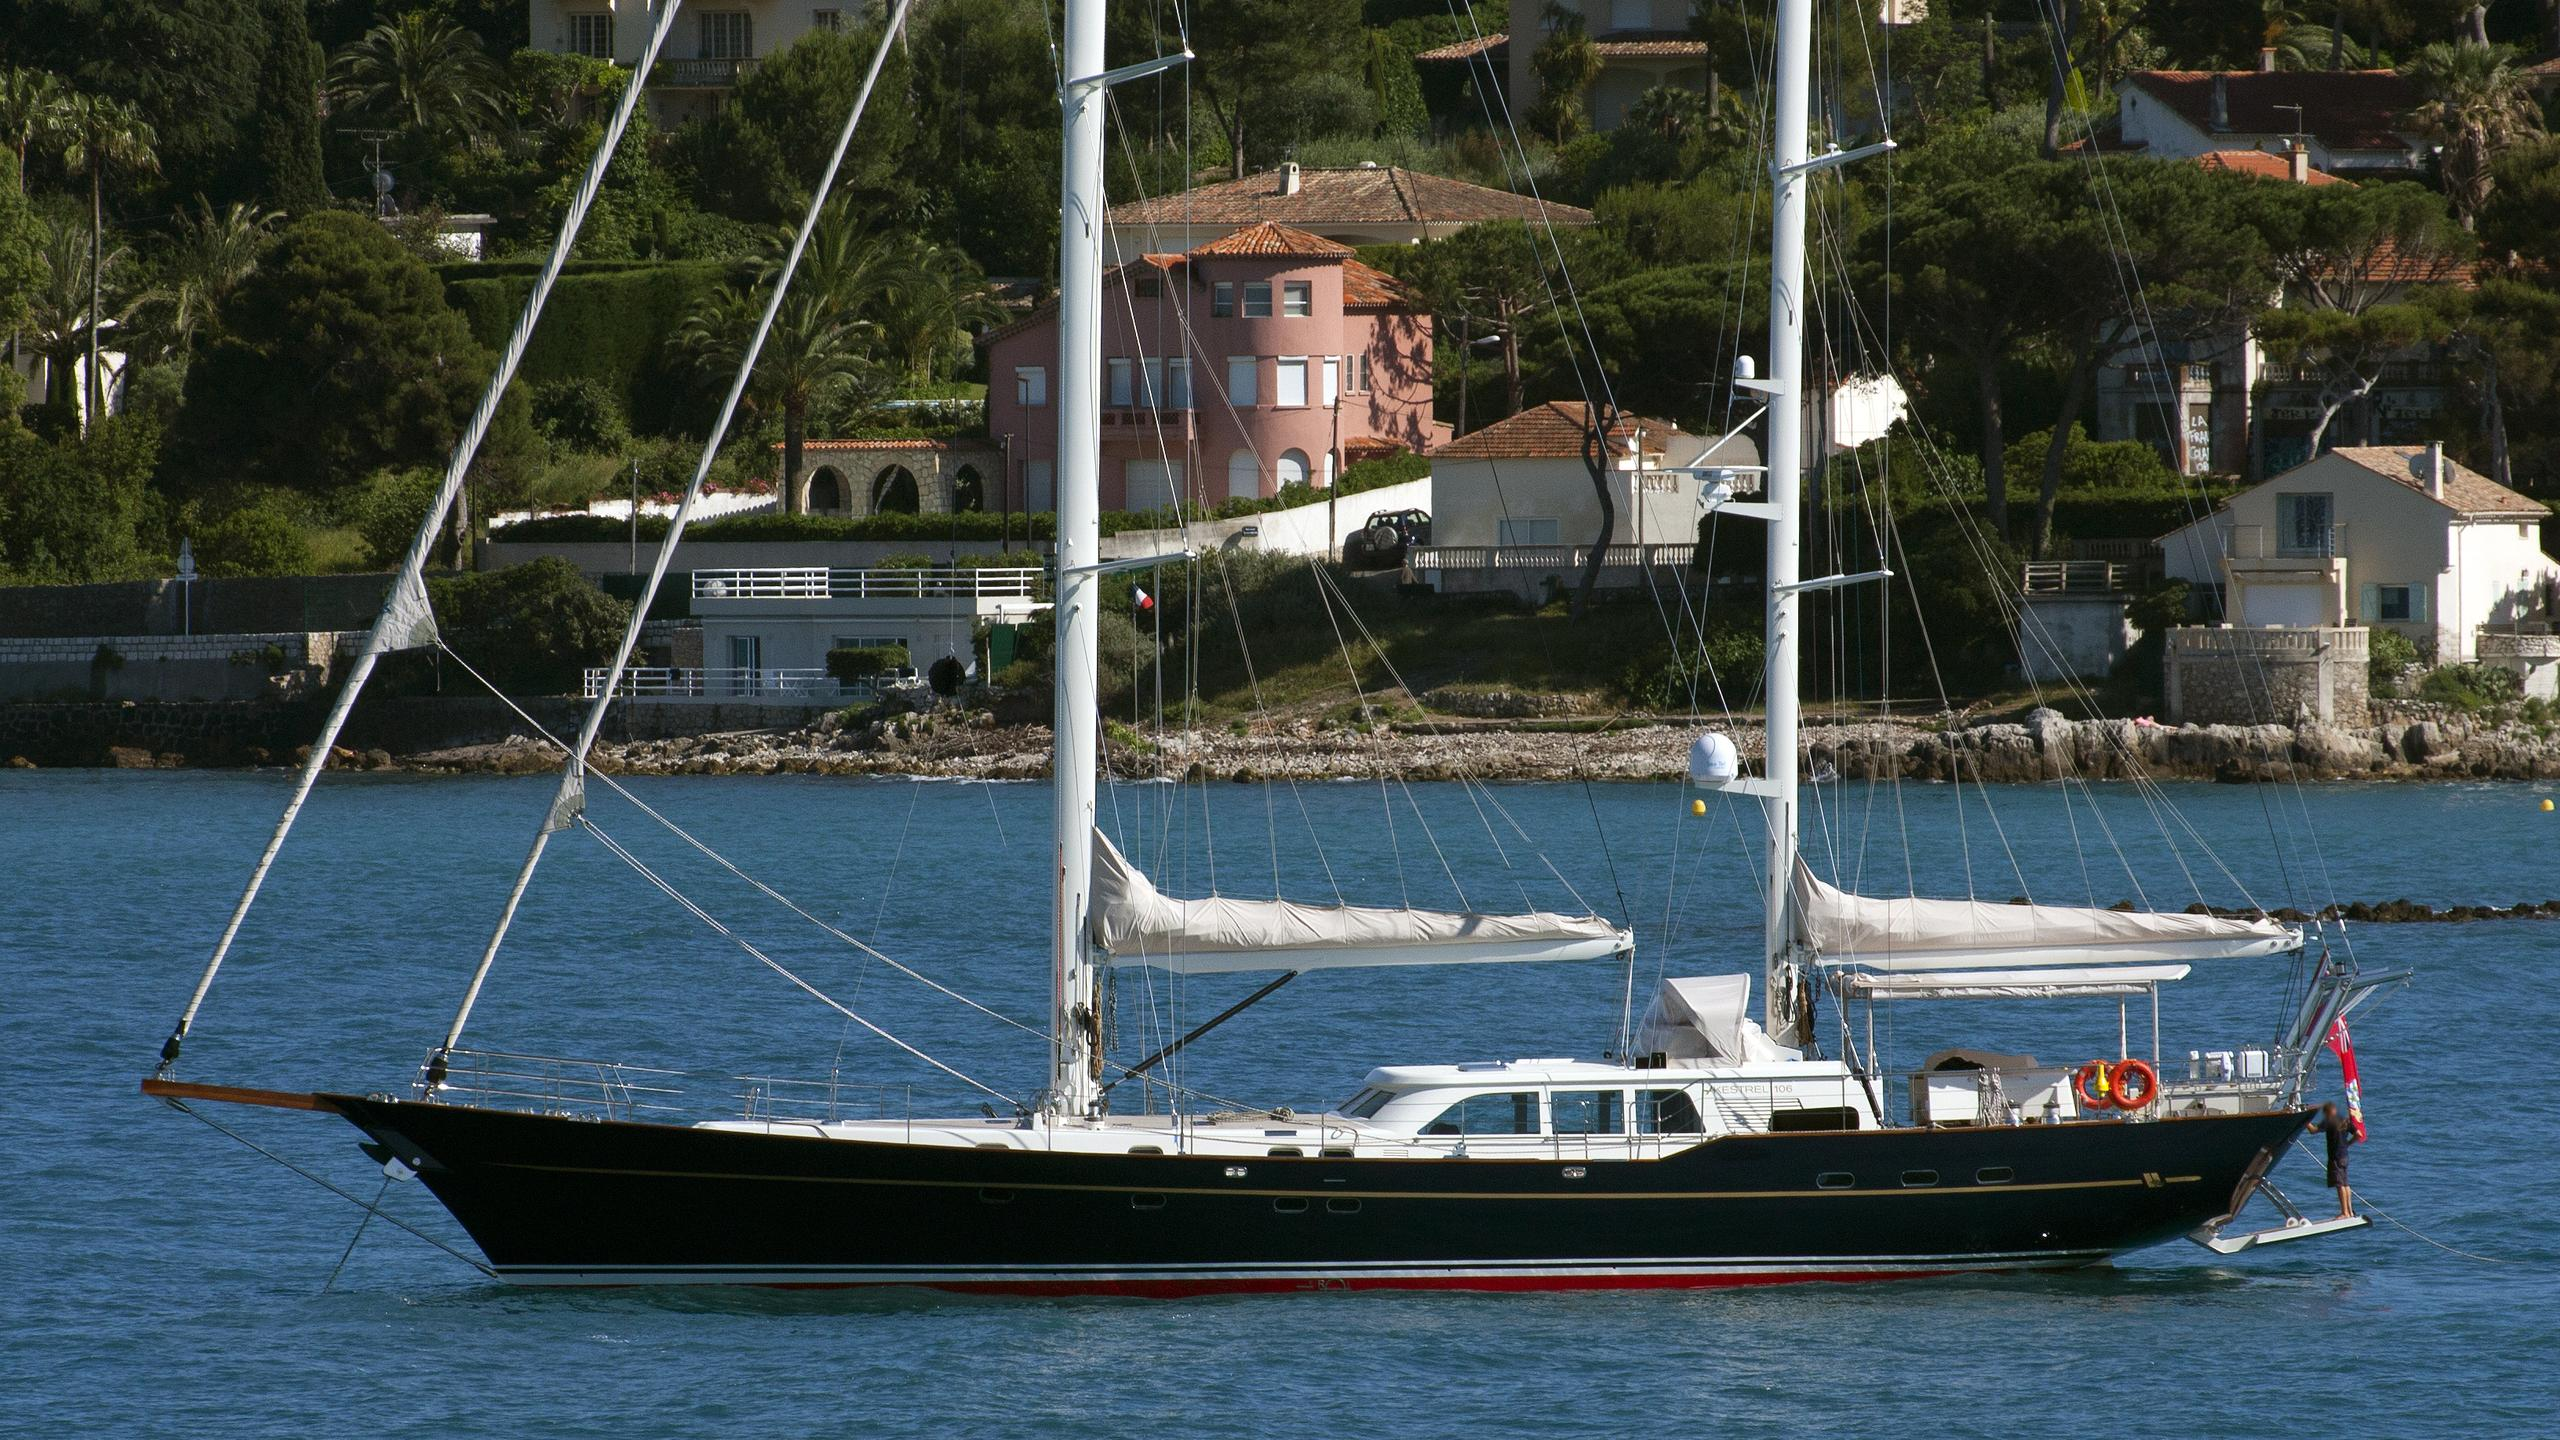 sila-sibiri-kestrel-yacht-exterior